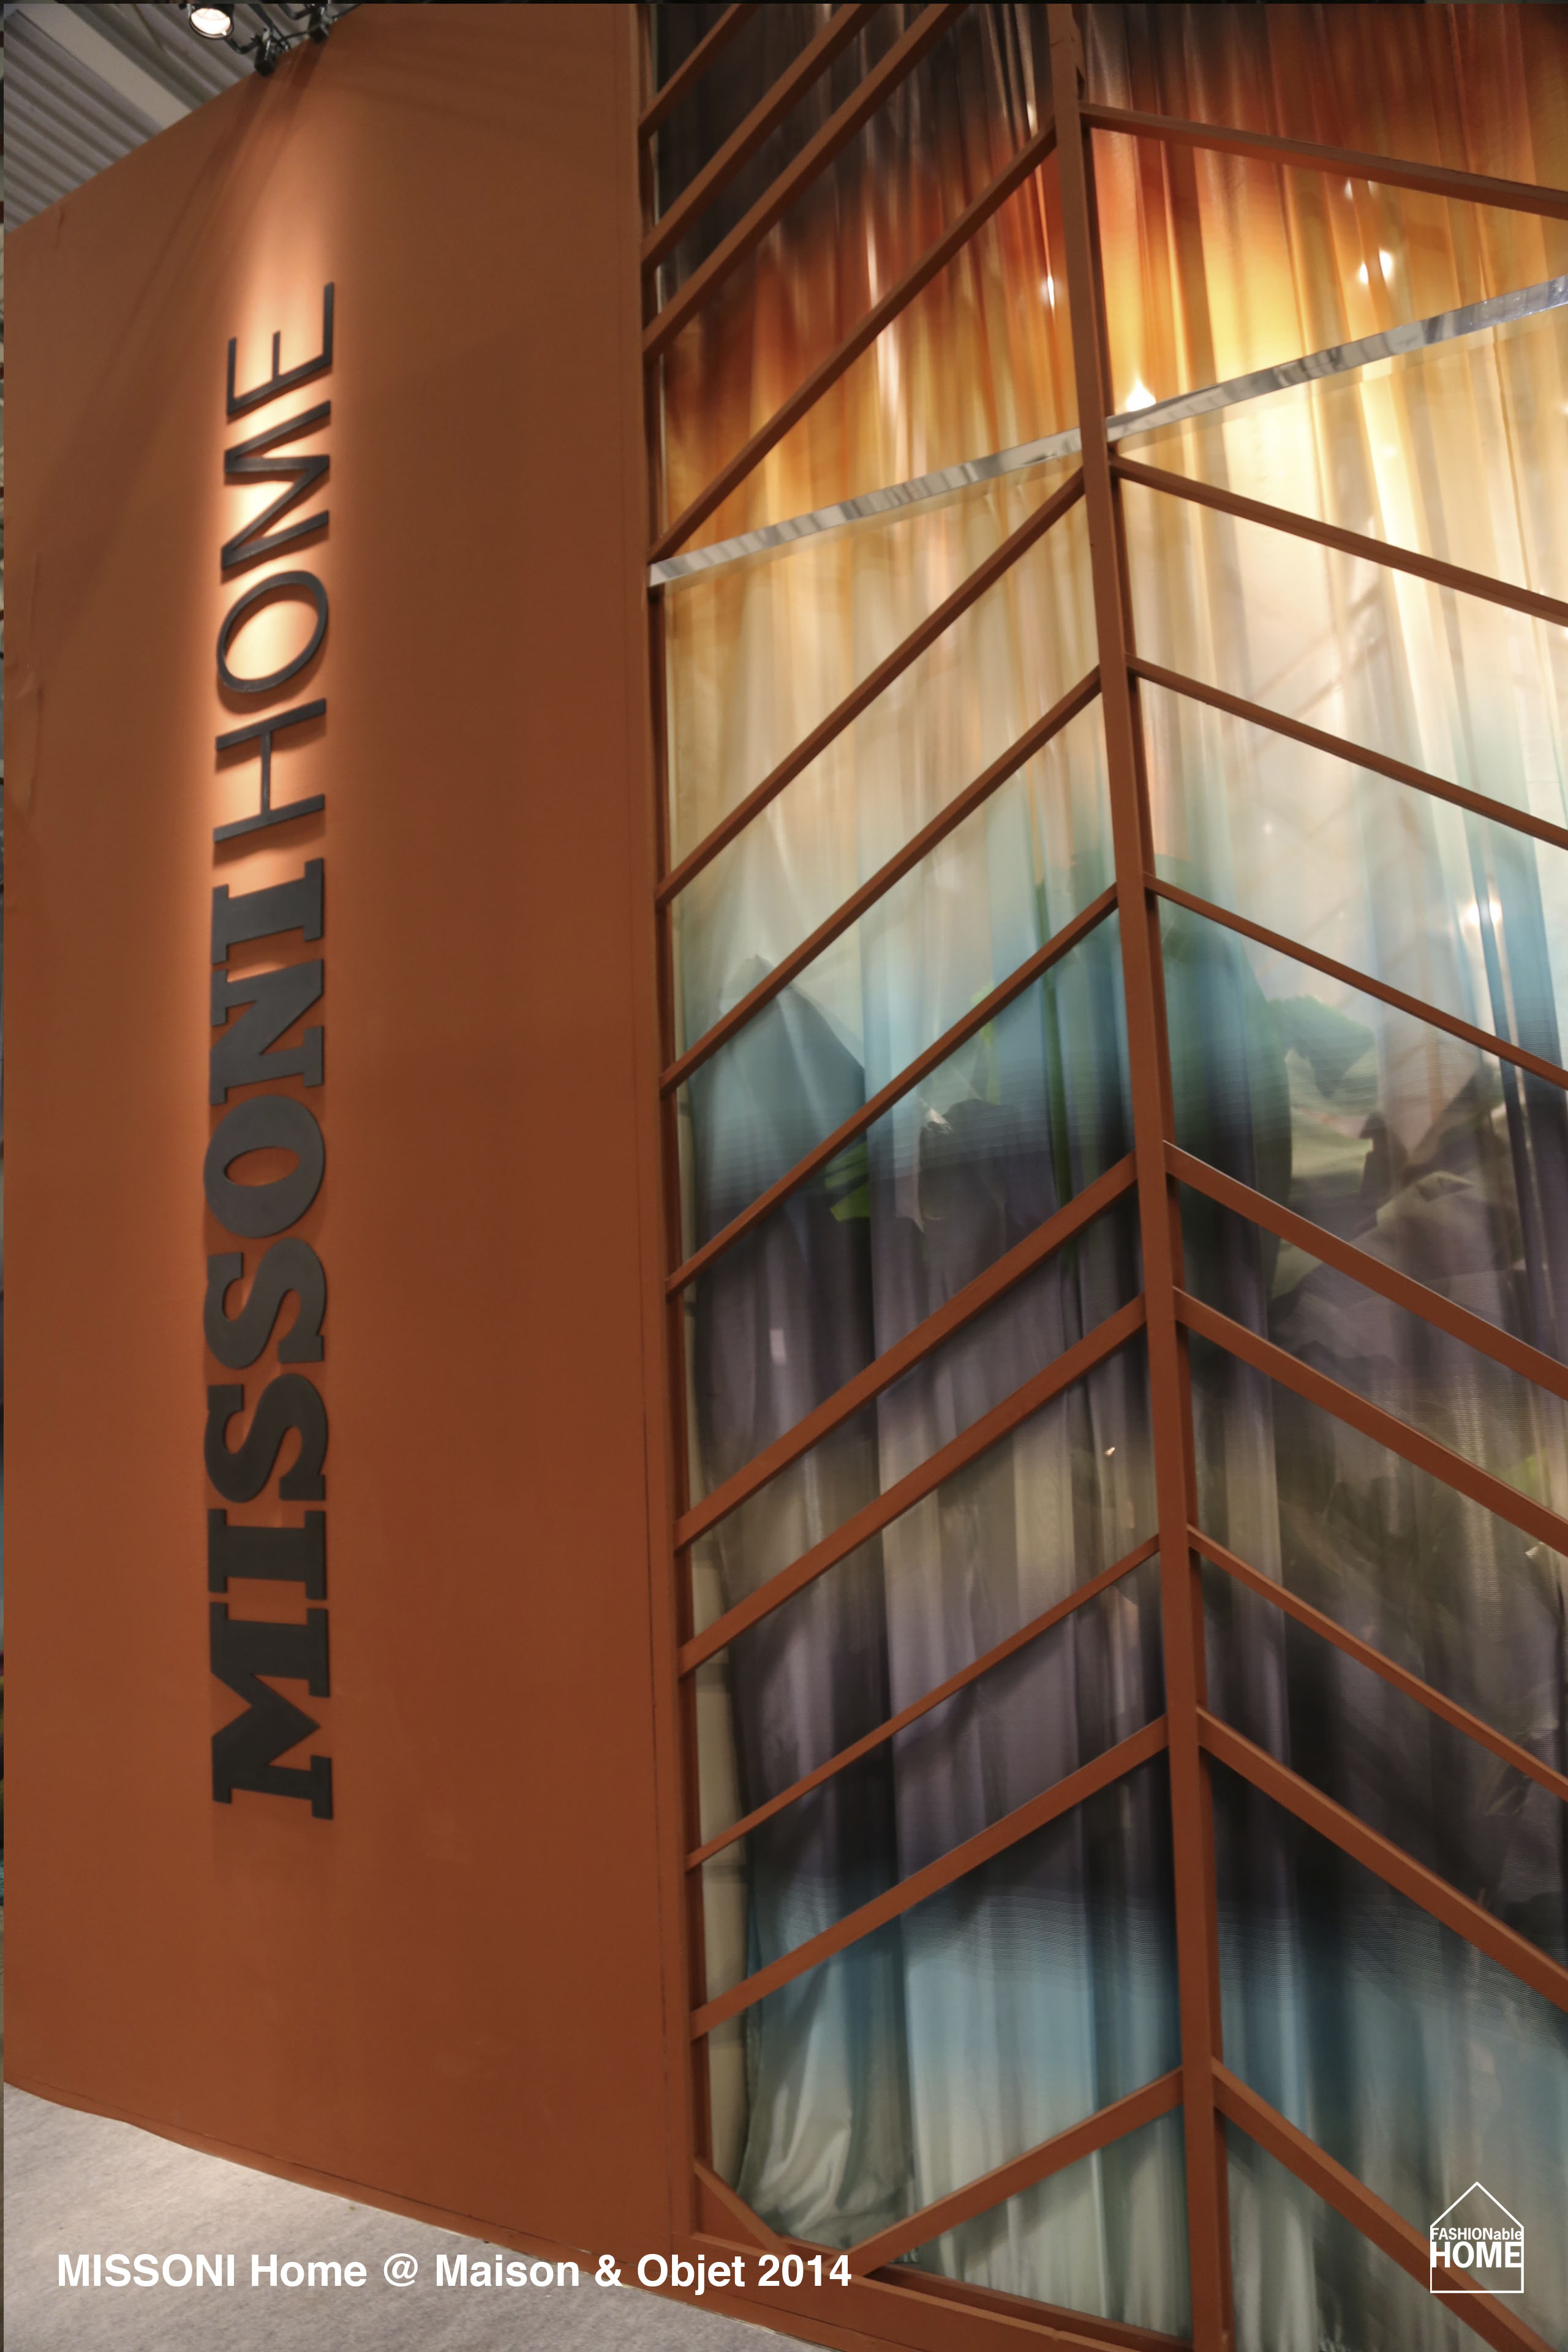 MISSONI Home @ Maison & Objet 2014 | Fashionable Home Blog